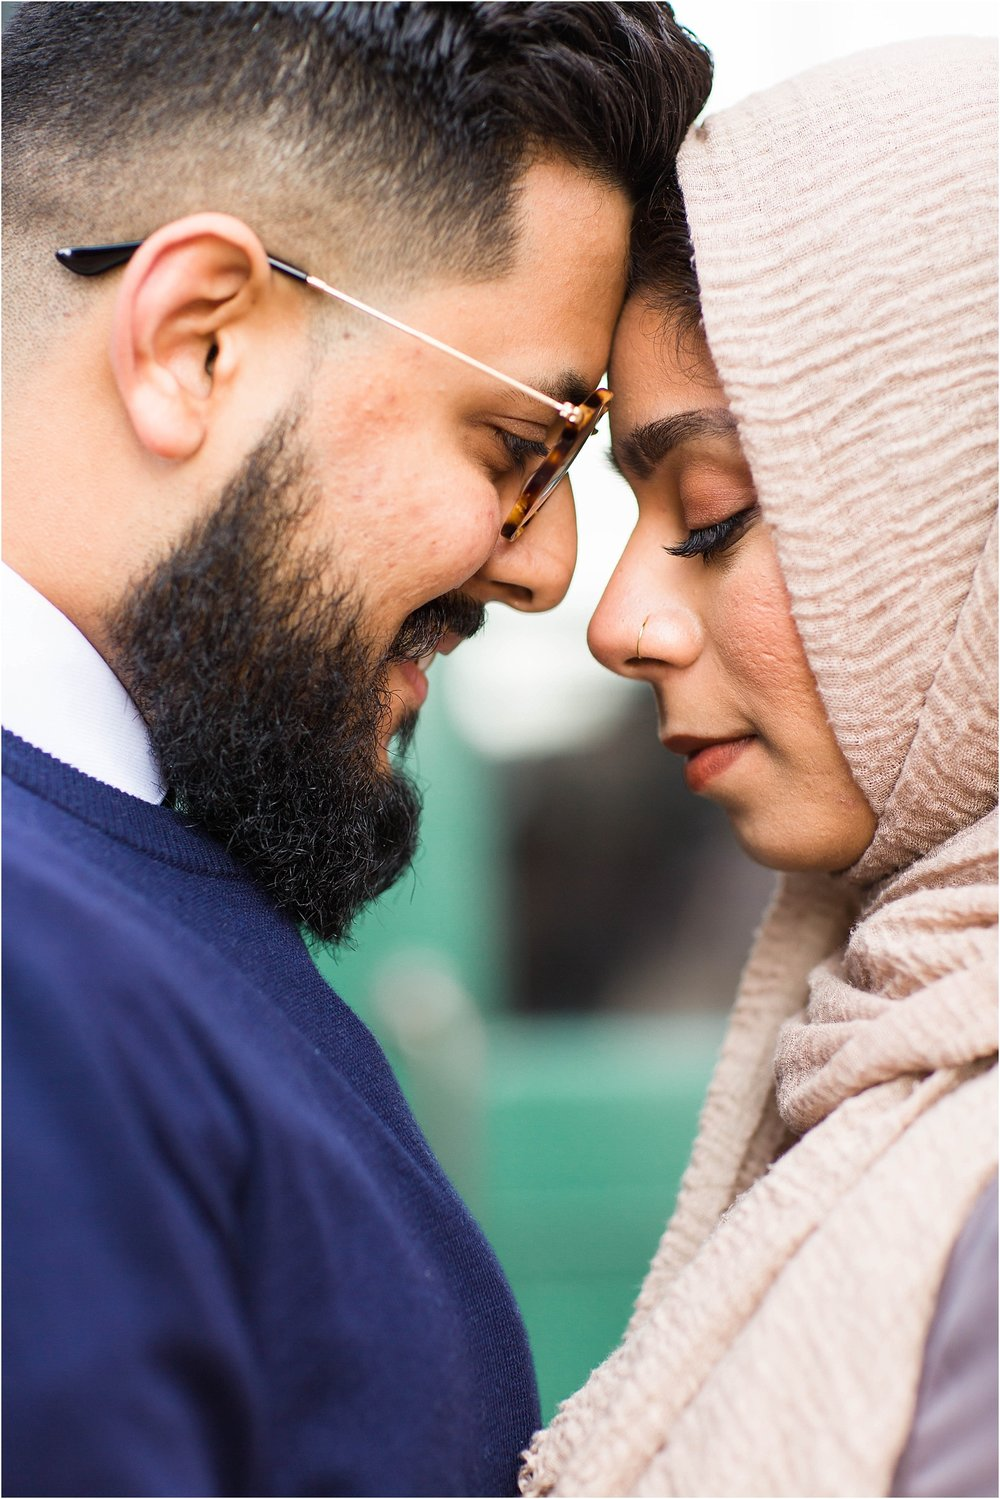 Polson-Pier-Distillery-District-Engagement-Session-Toronto-Mississauga-Brampton-Scarborough-GTA-Pakistani-Indian-Wedding-Engagement-Photographer-Photography_0040.jpg